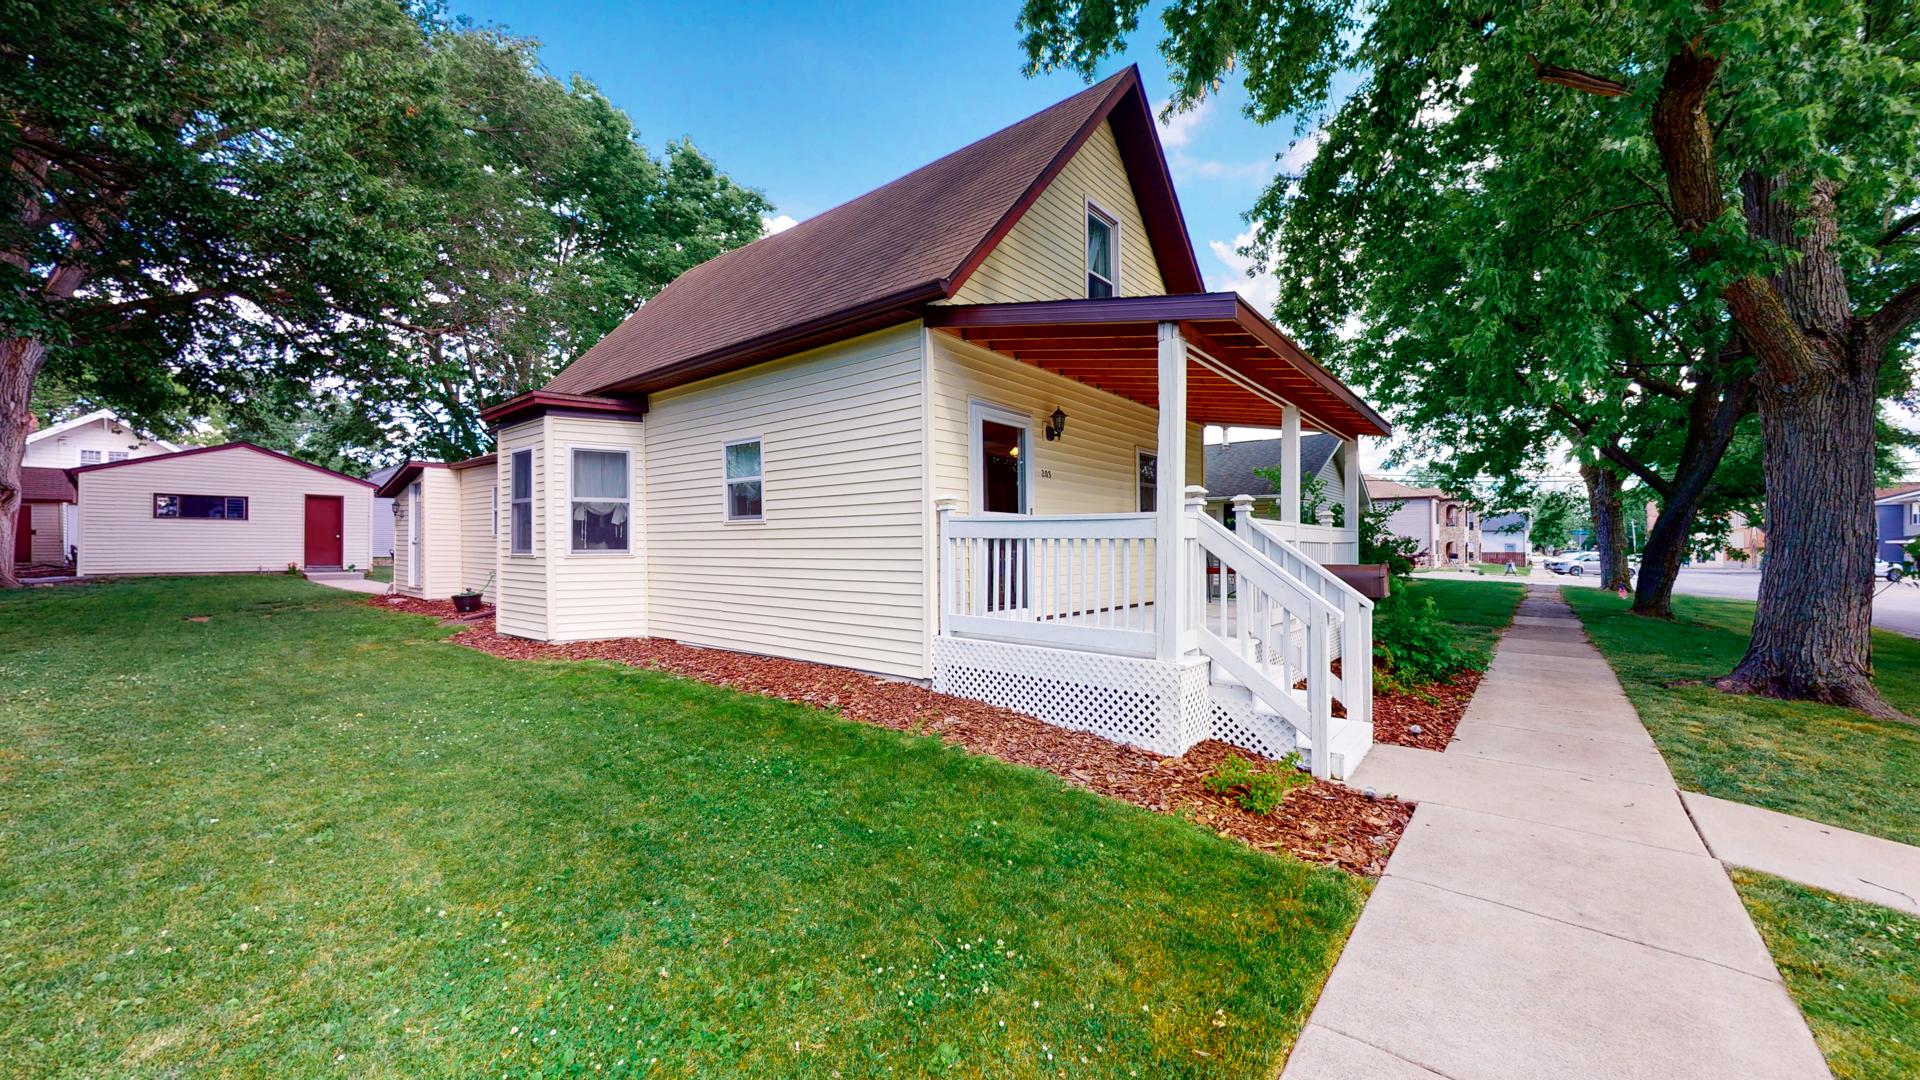 203 Cedar ,Lexington, Illinois 61753